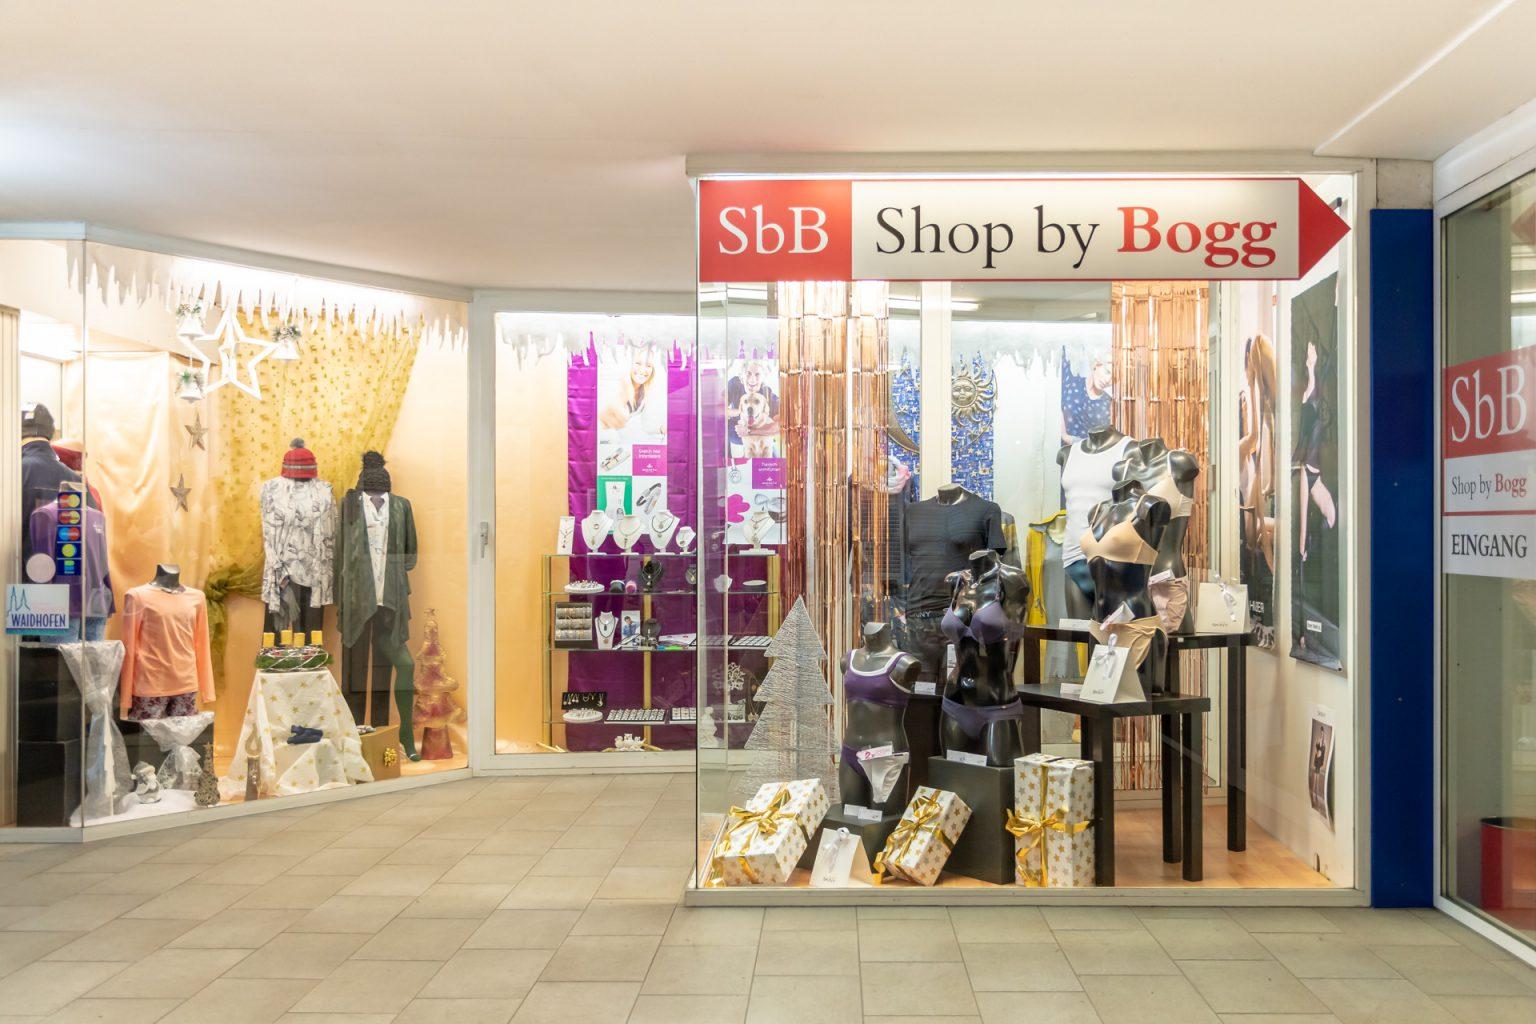 shopbybogg_matthias_ledwinka-21